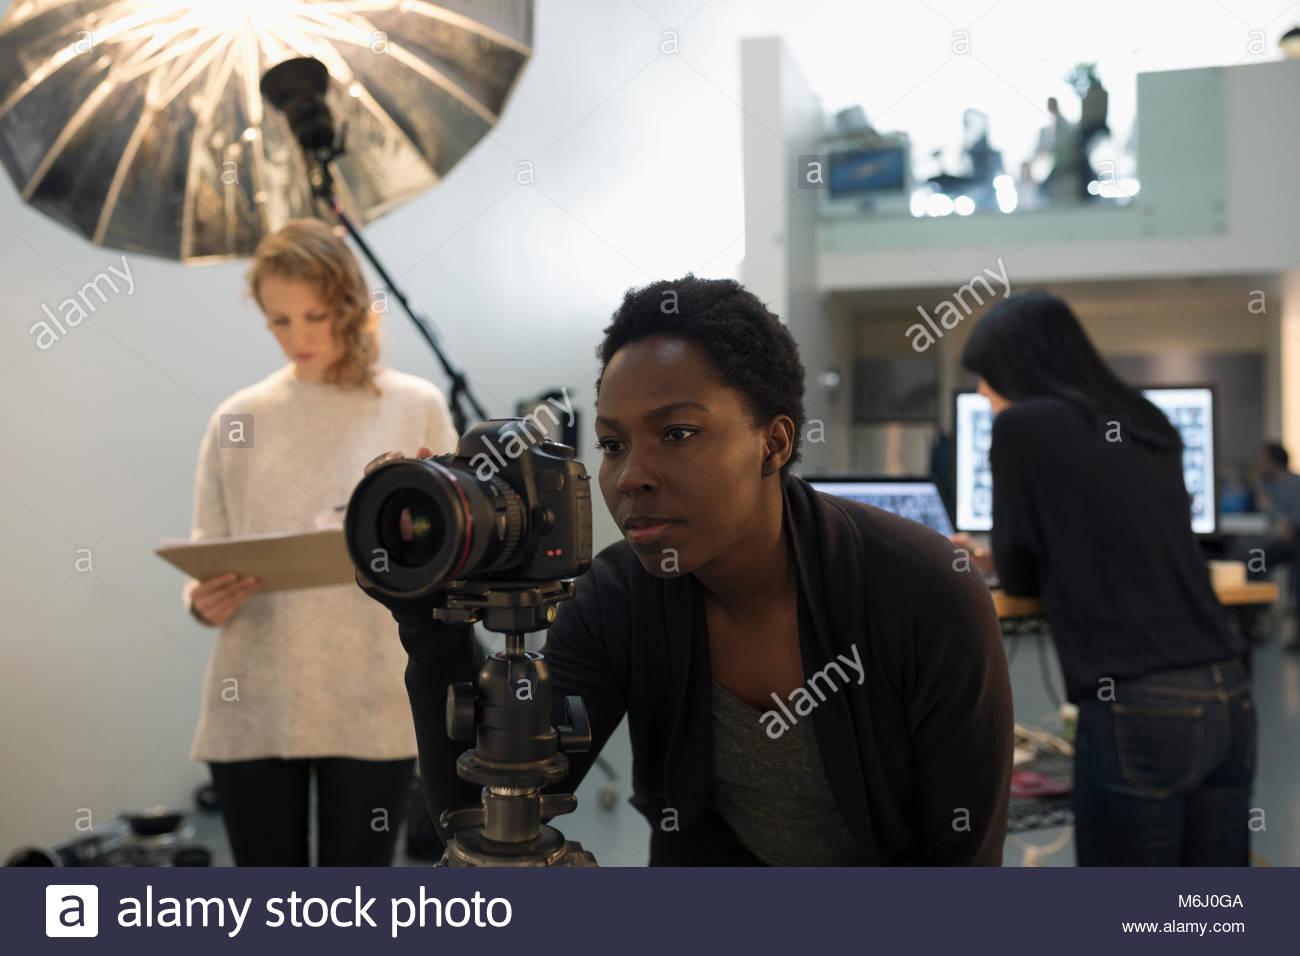 Focused female photographer using digital camera at photo shoot in studio Stock Photo